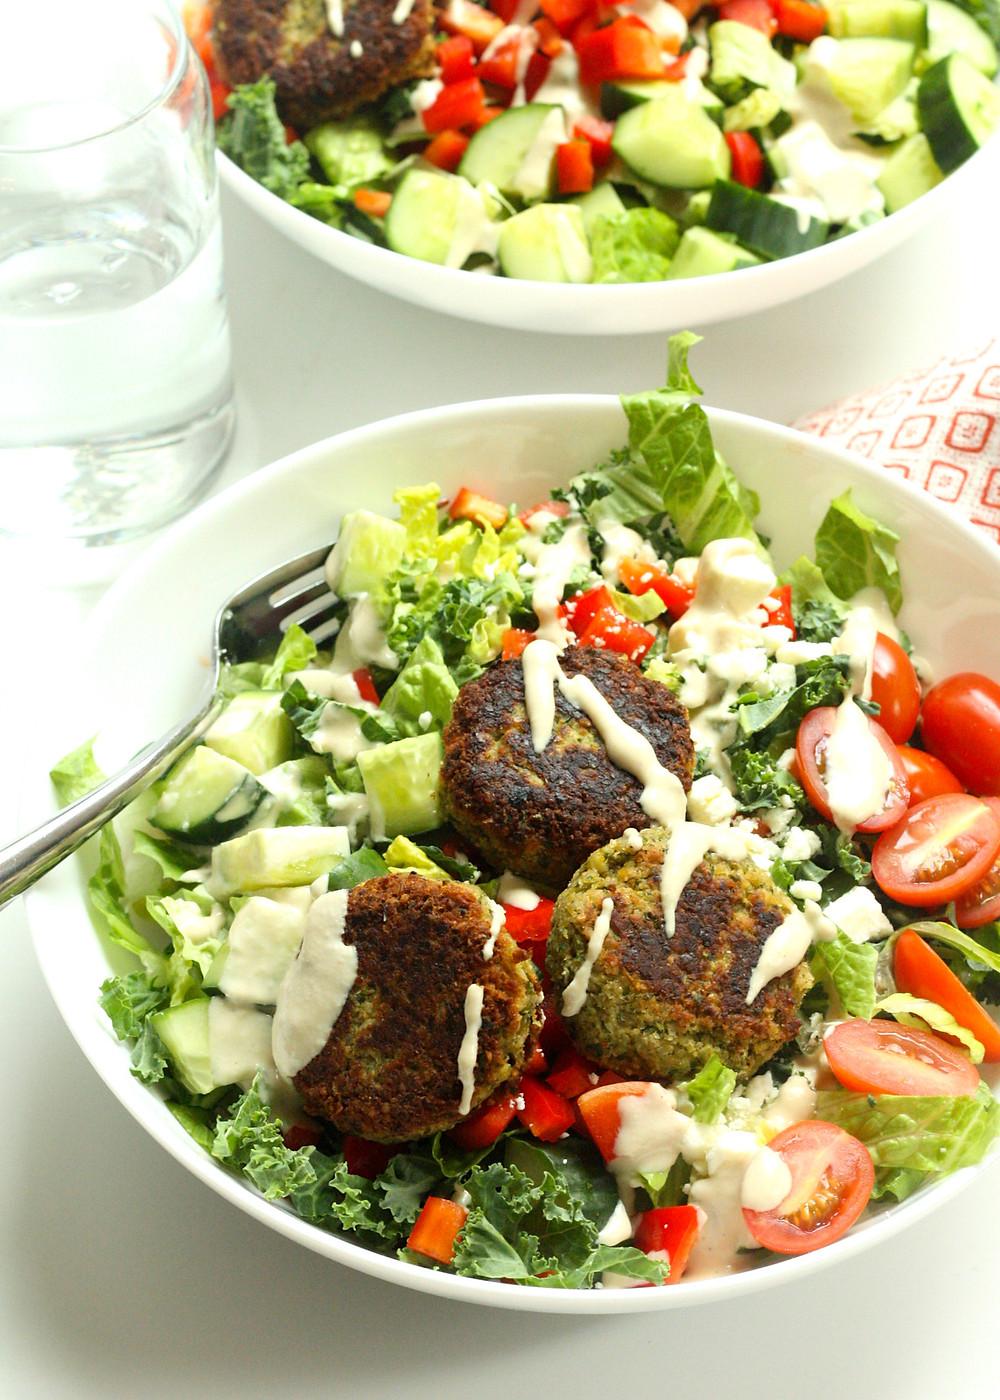 Eggplant Falafel Salad Bowls with Tahini Sauce